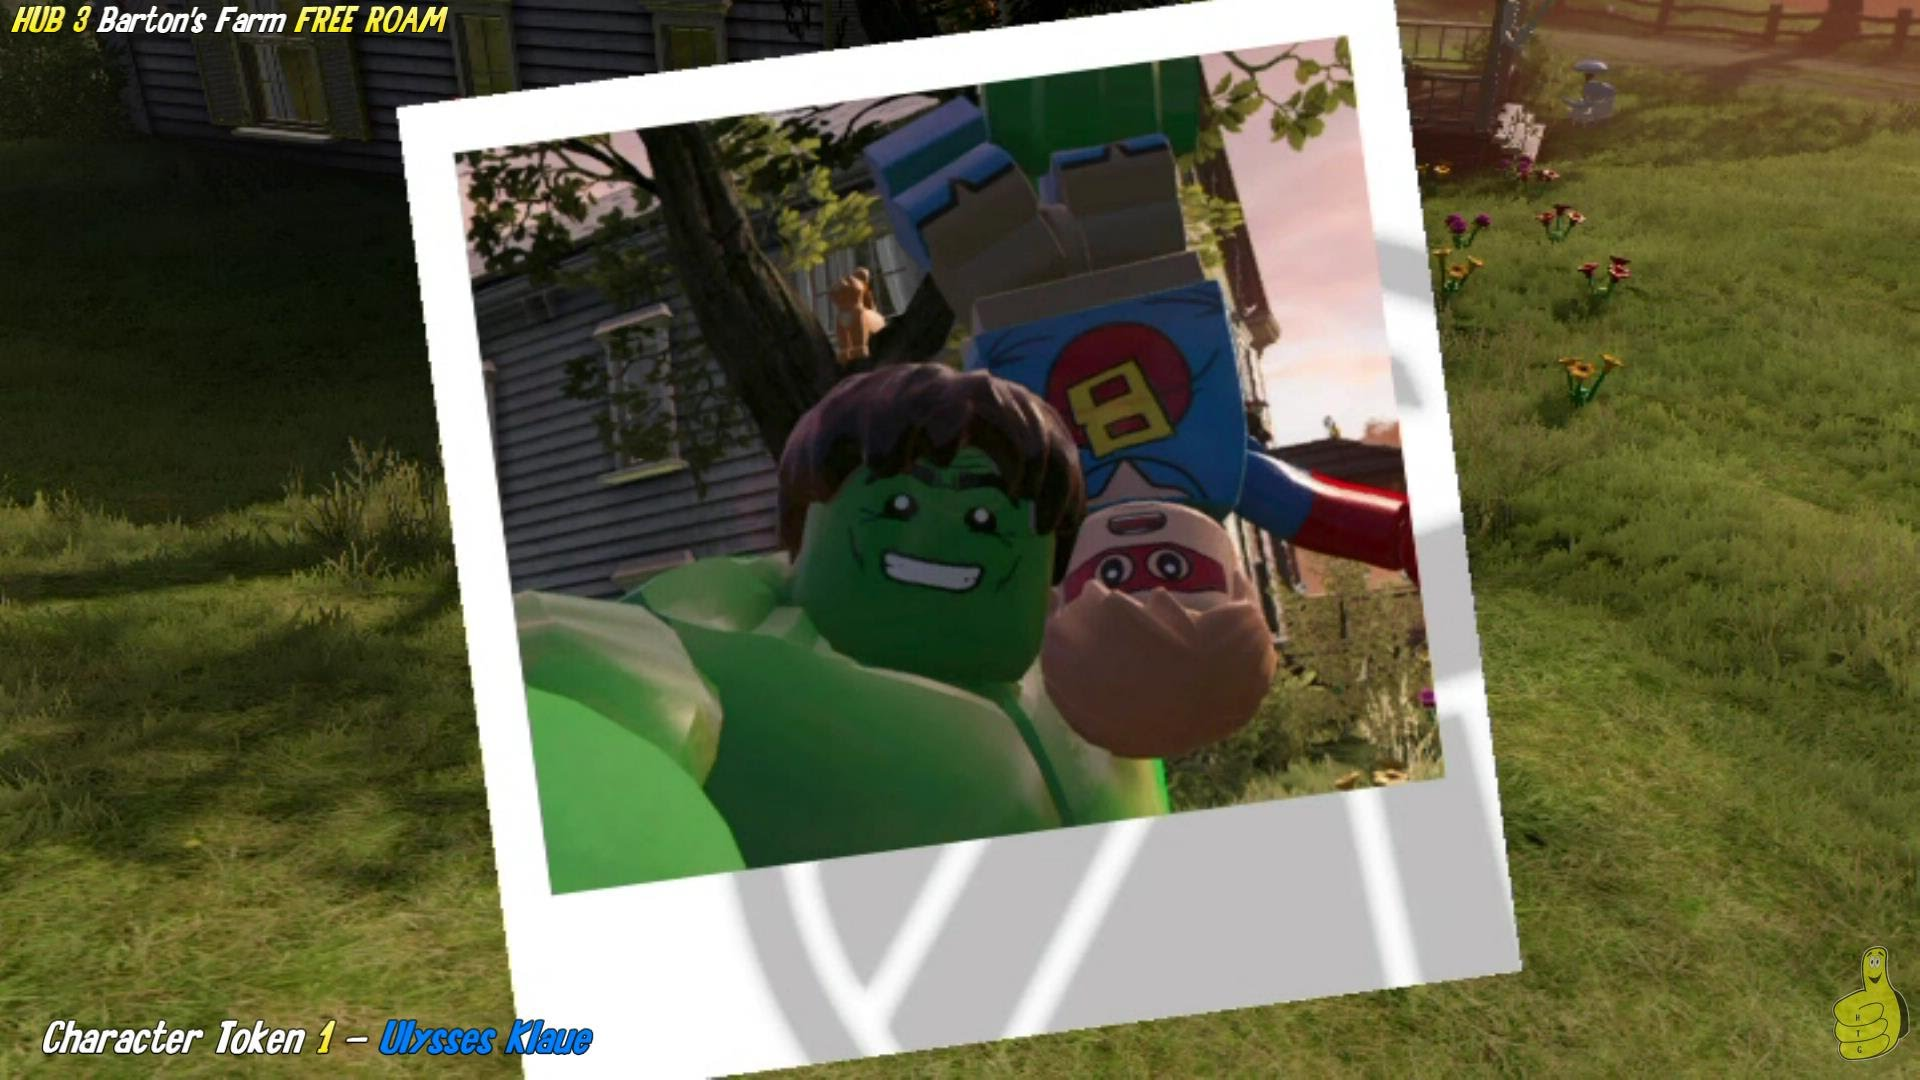 Lego Marvel Avengers: HUB 3 / Barton's Farm FREE ROAM (All Collectibles) – HTG